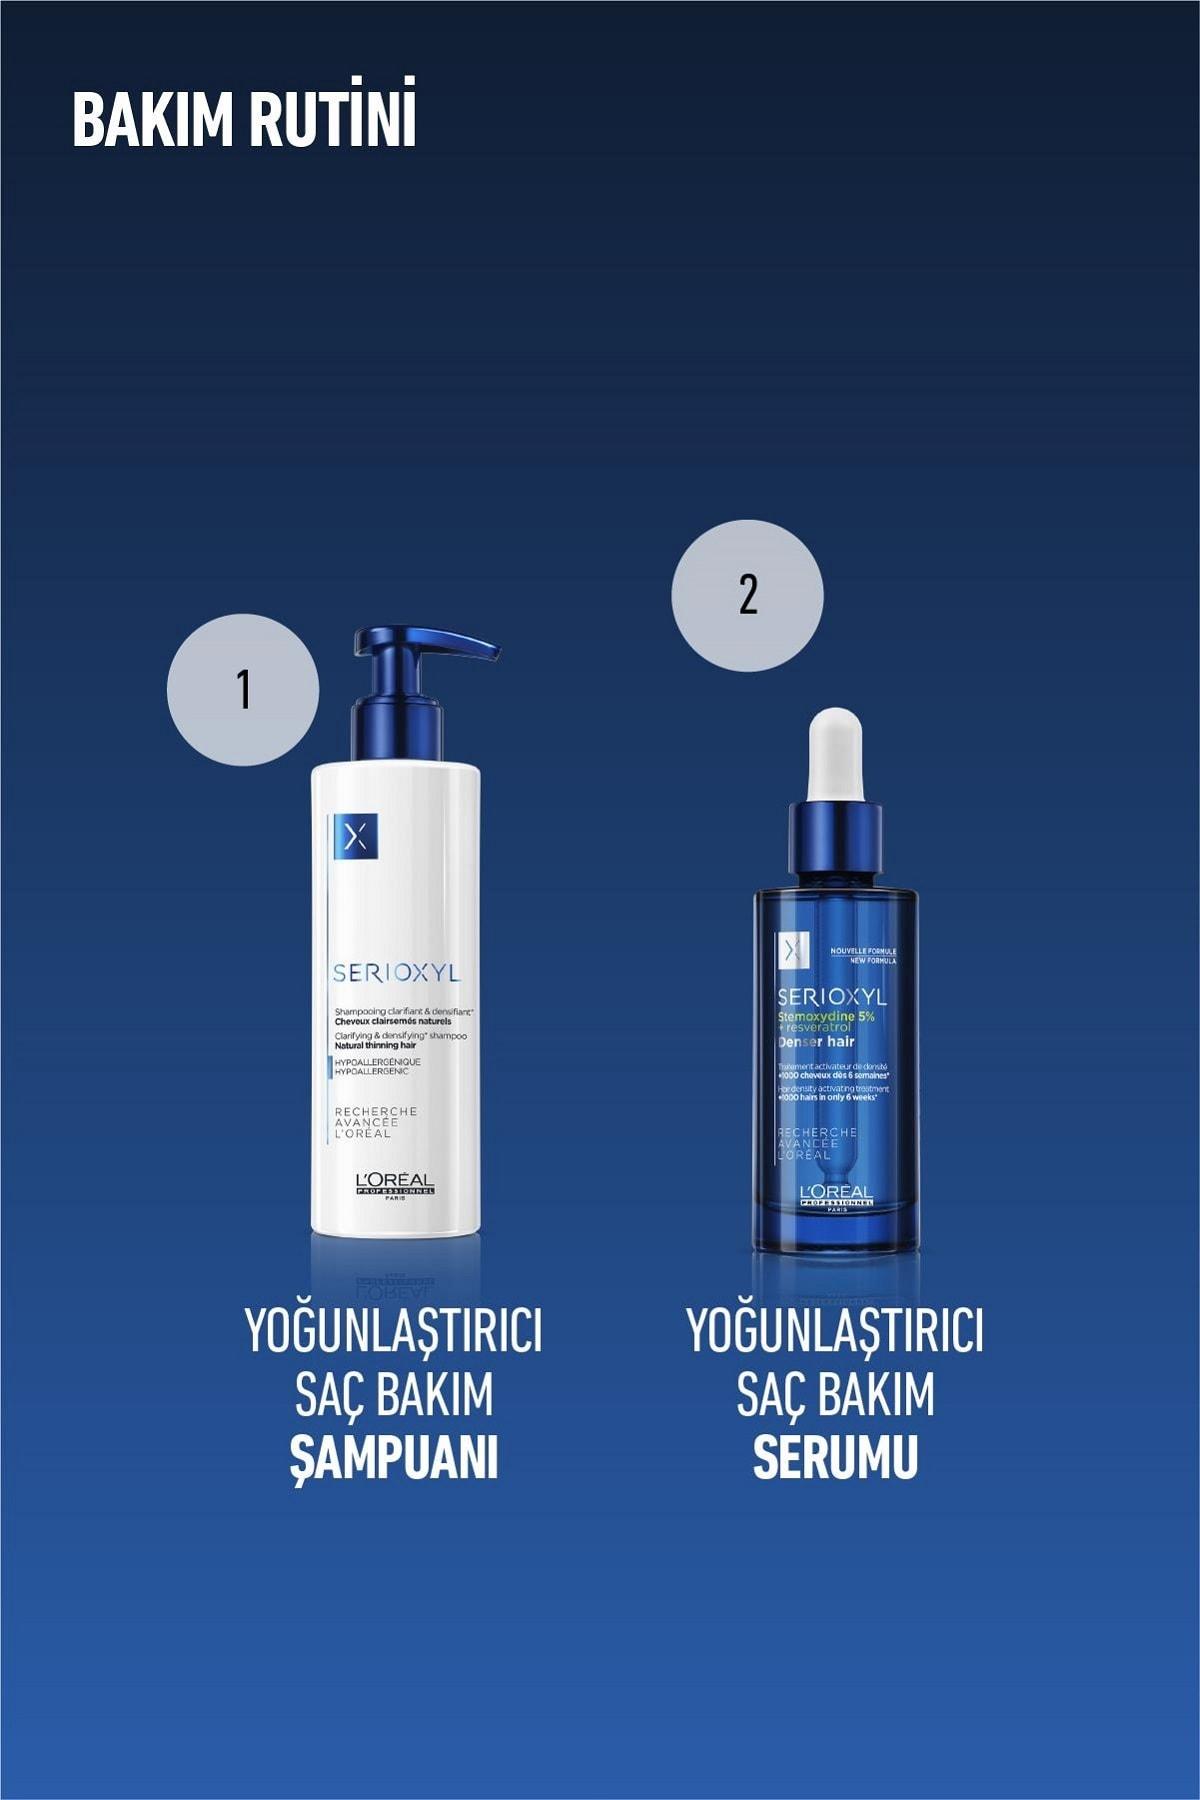 L'oreal Professionnel Serioxyl Denser Hair Yoğunluk Arttırıcı Serum 90 ml 3